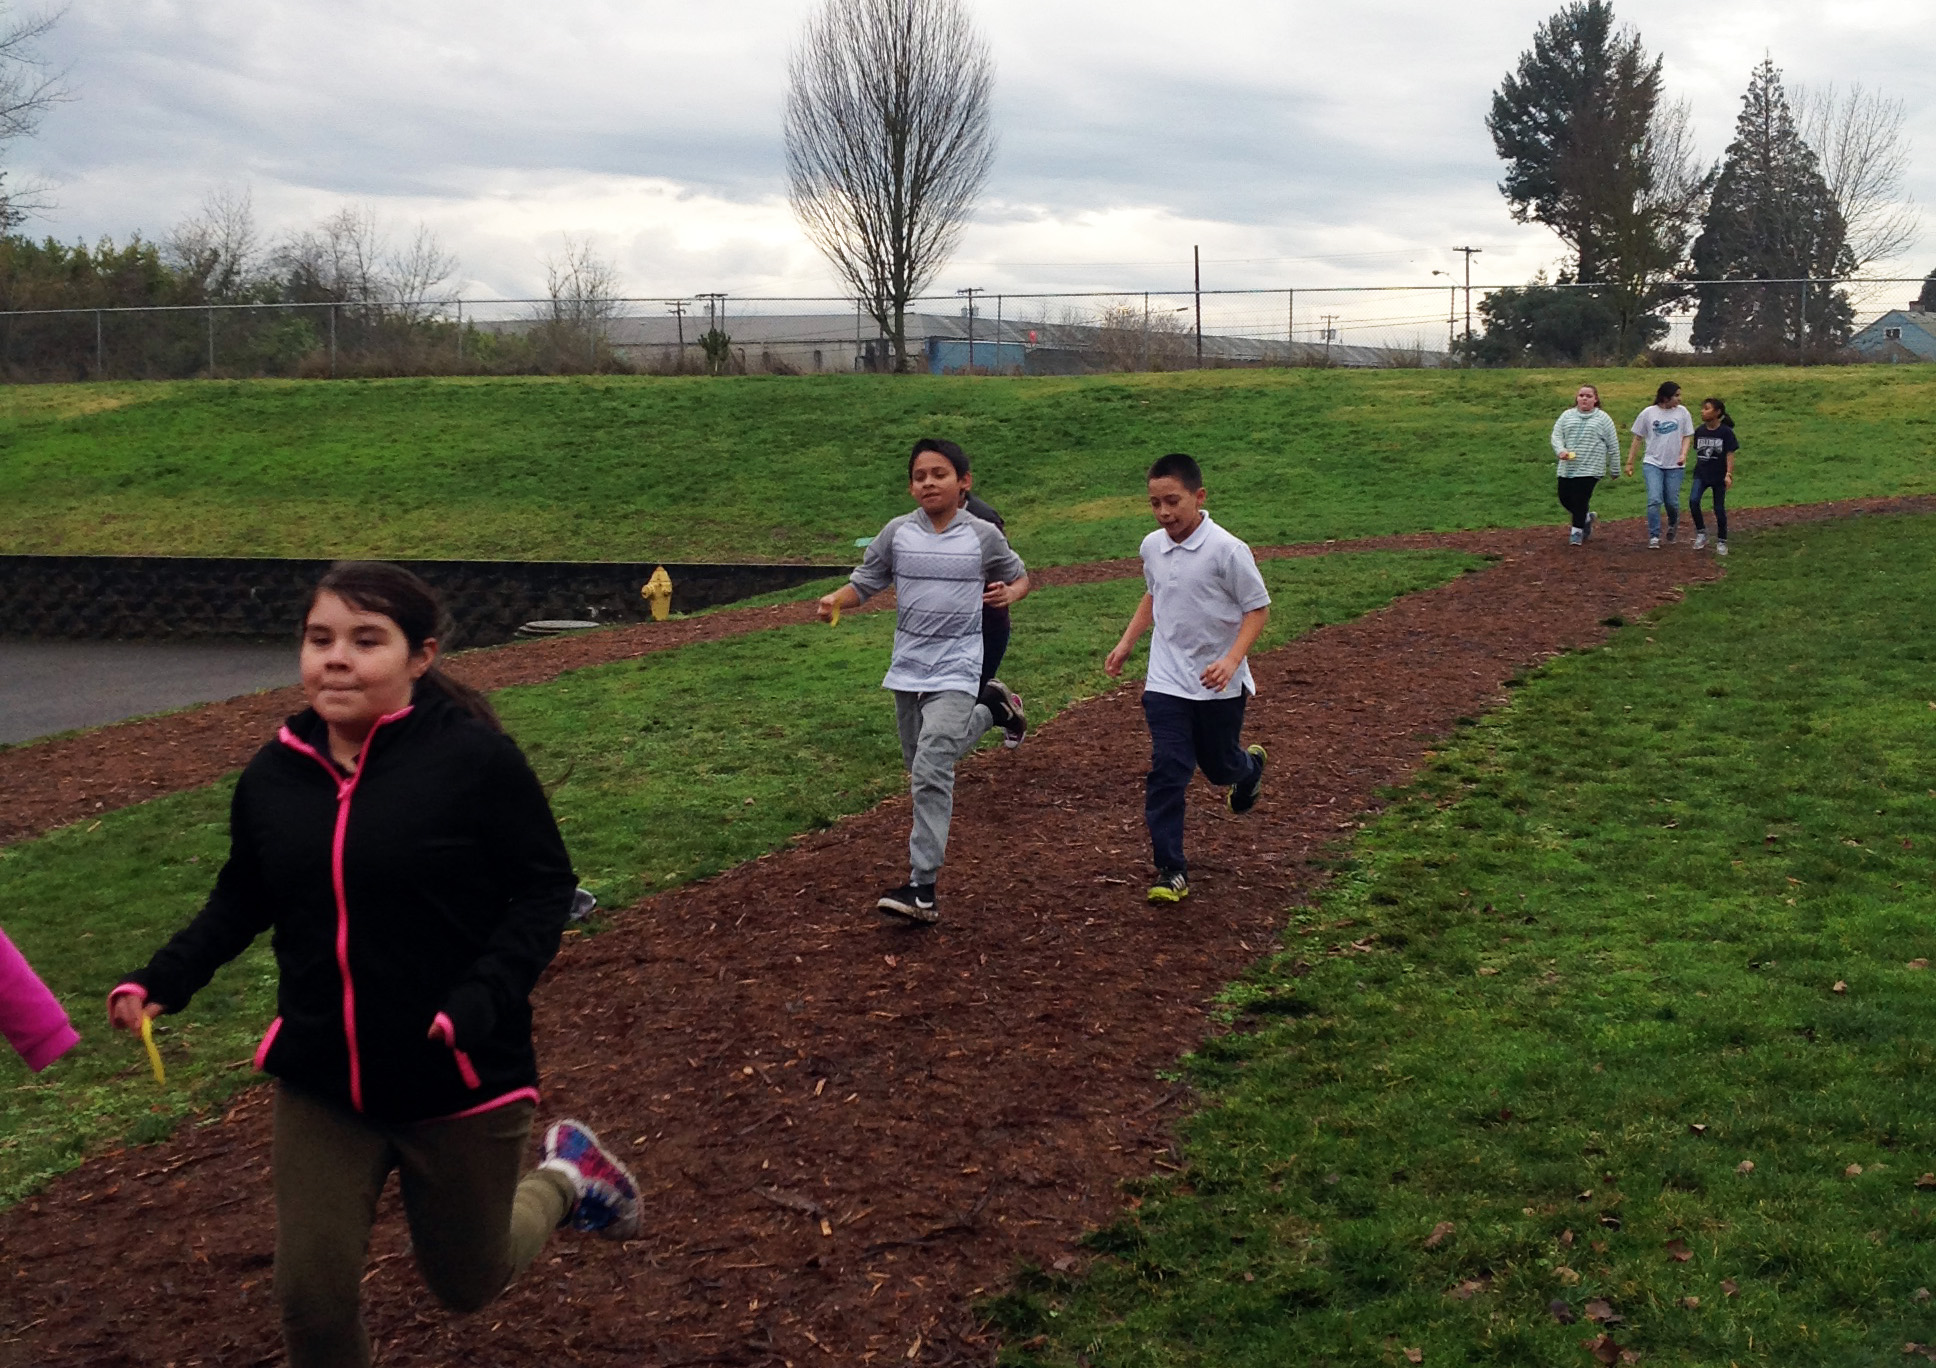 Kids running around a dirt track.